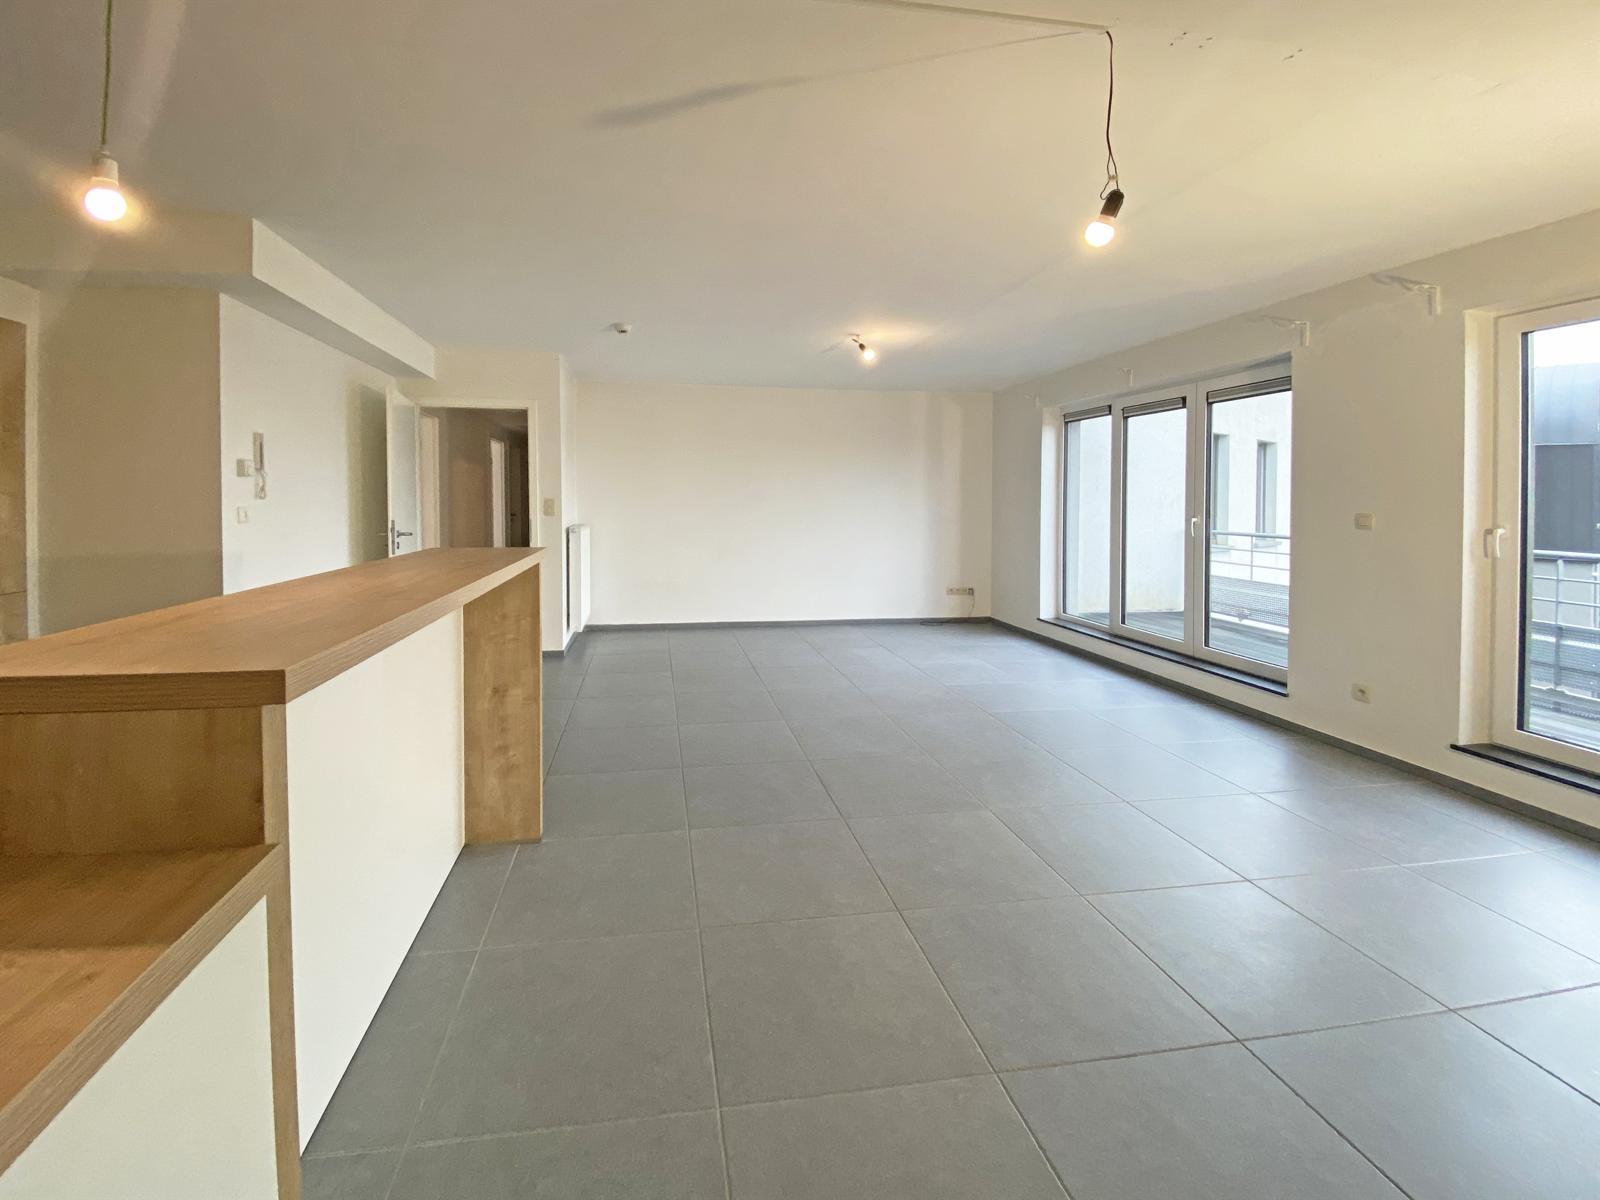 Appartement - Bertrix - #4507479-2